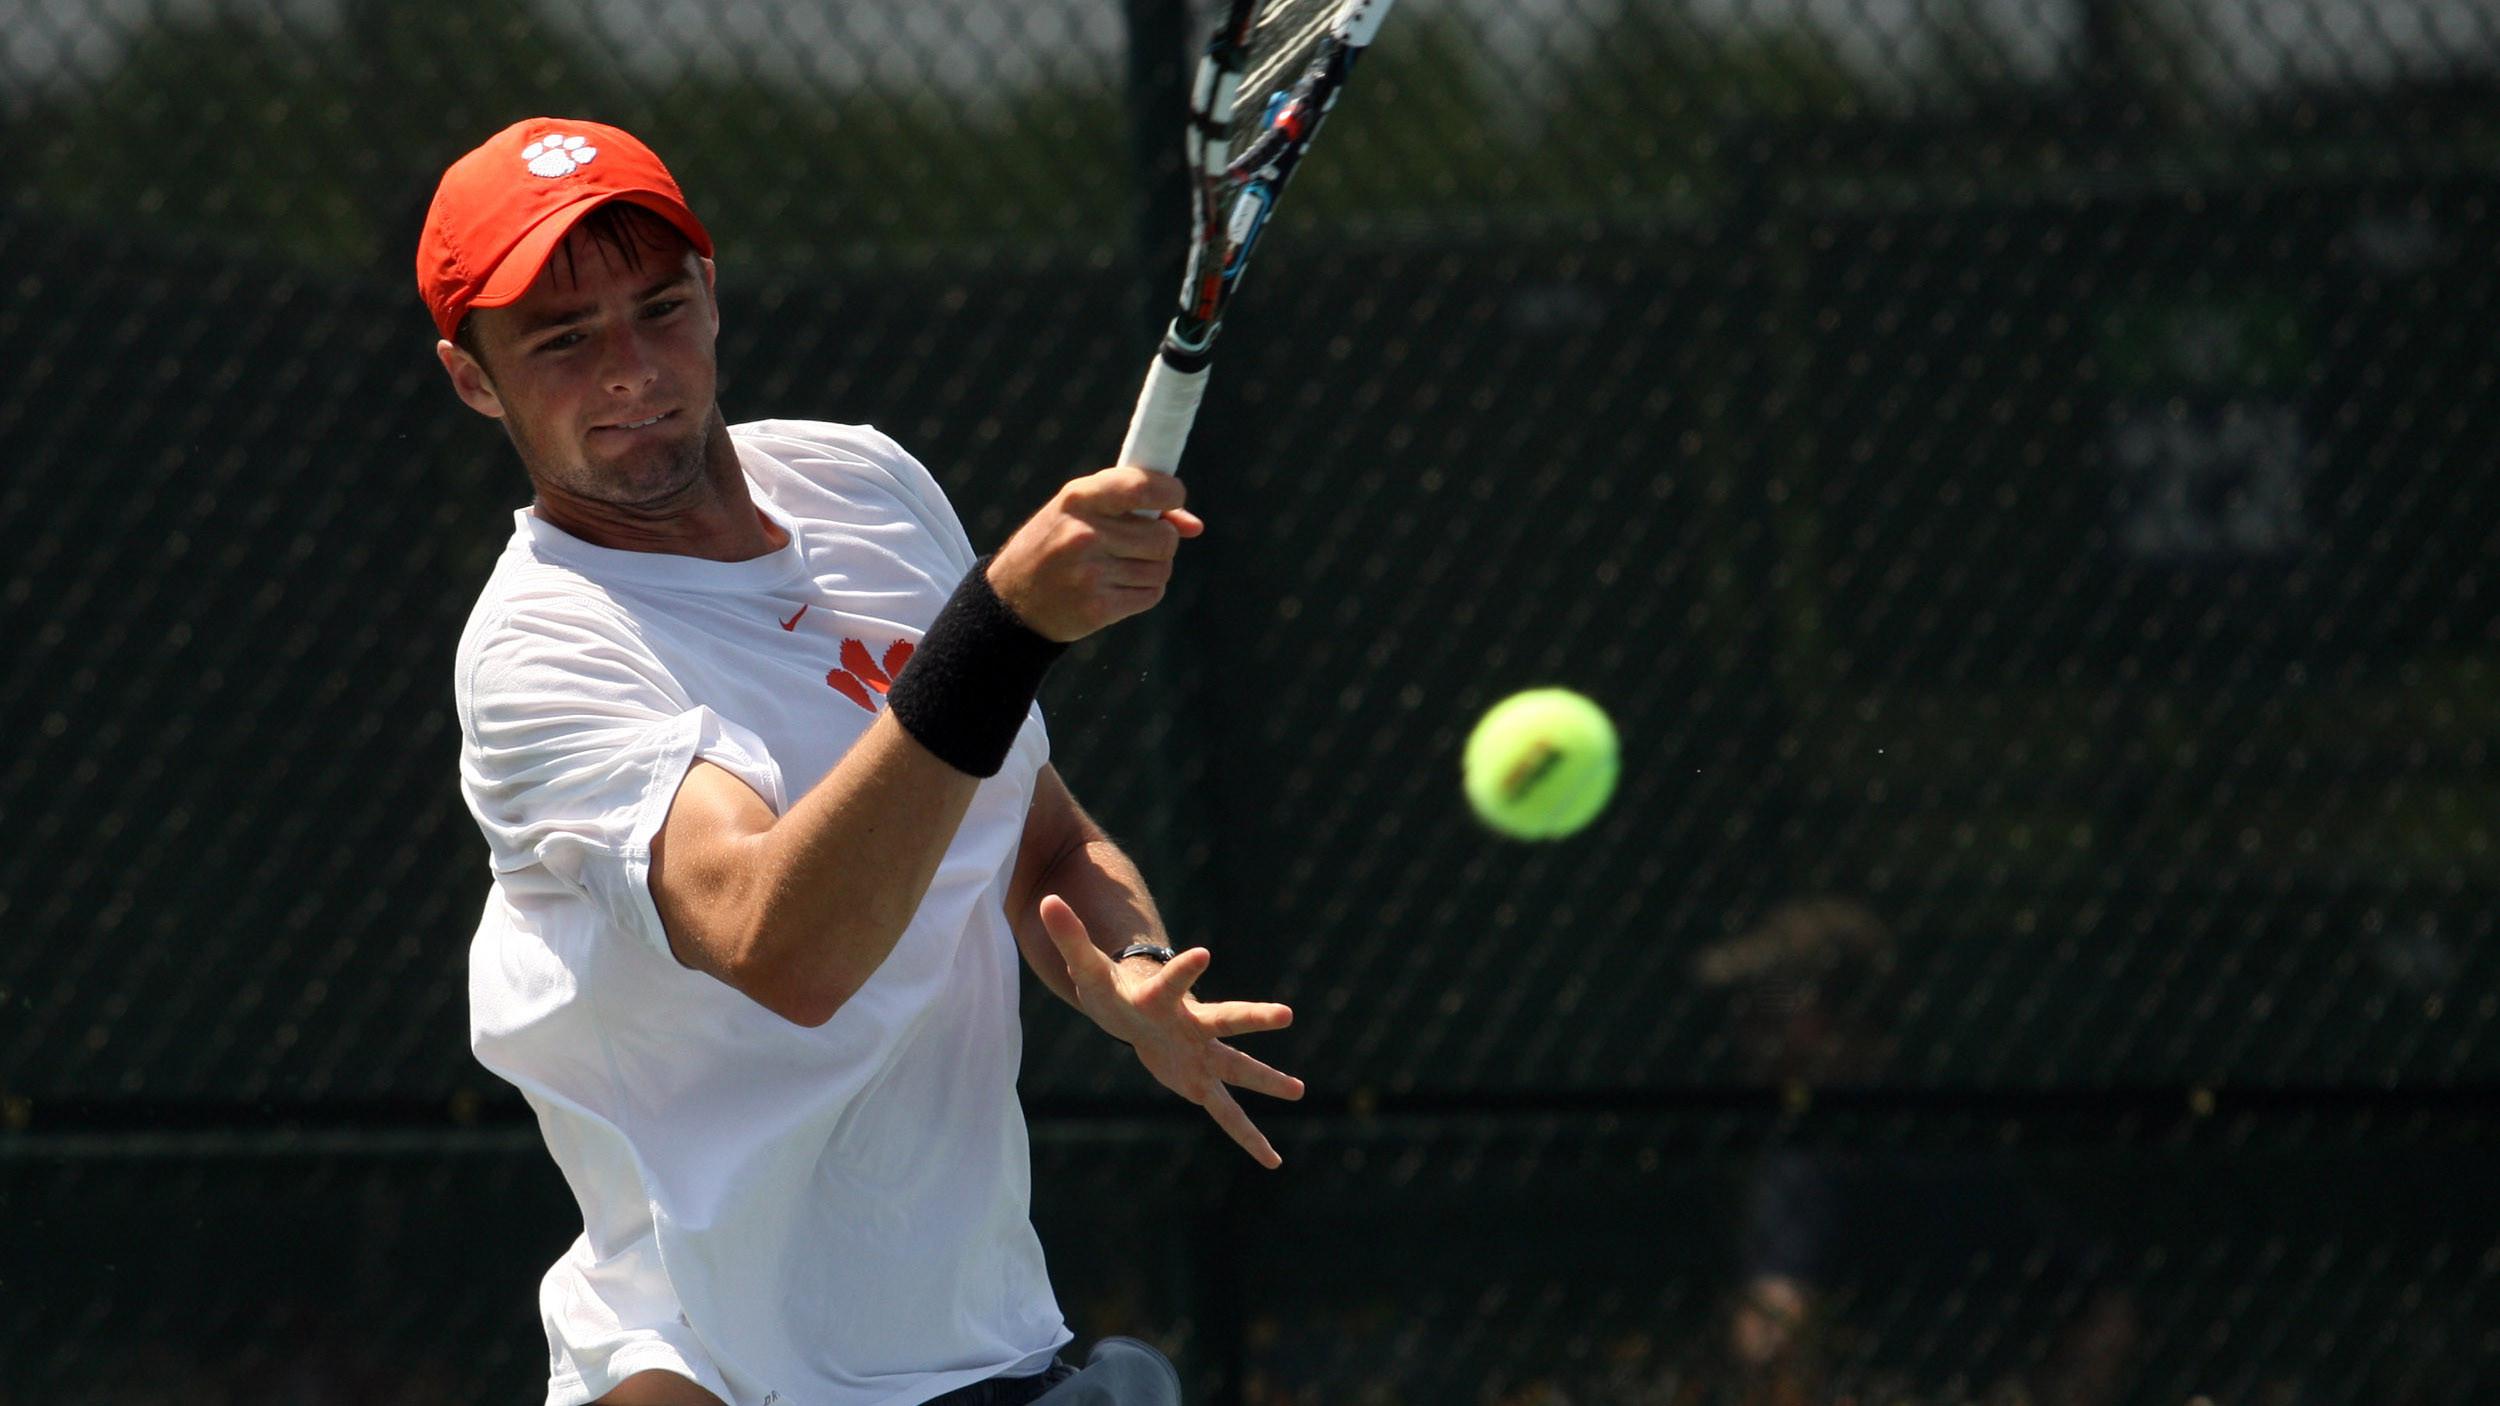 Clemson Men's Tennis Team is Ranked 23rd